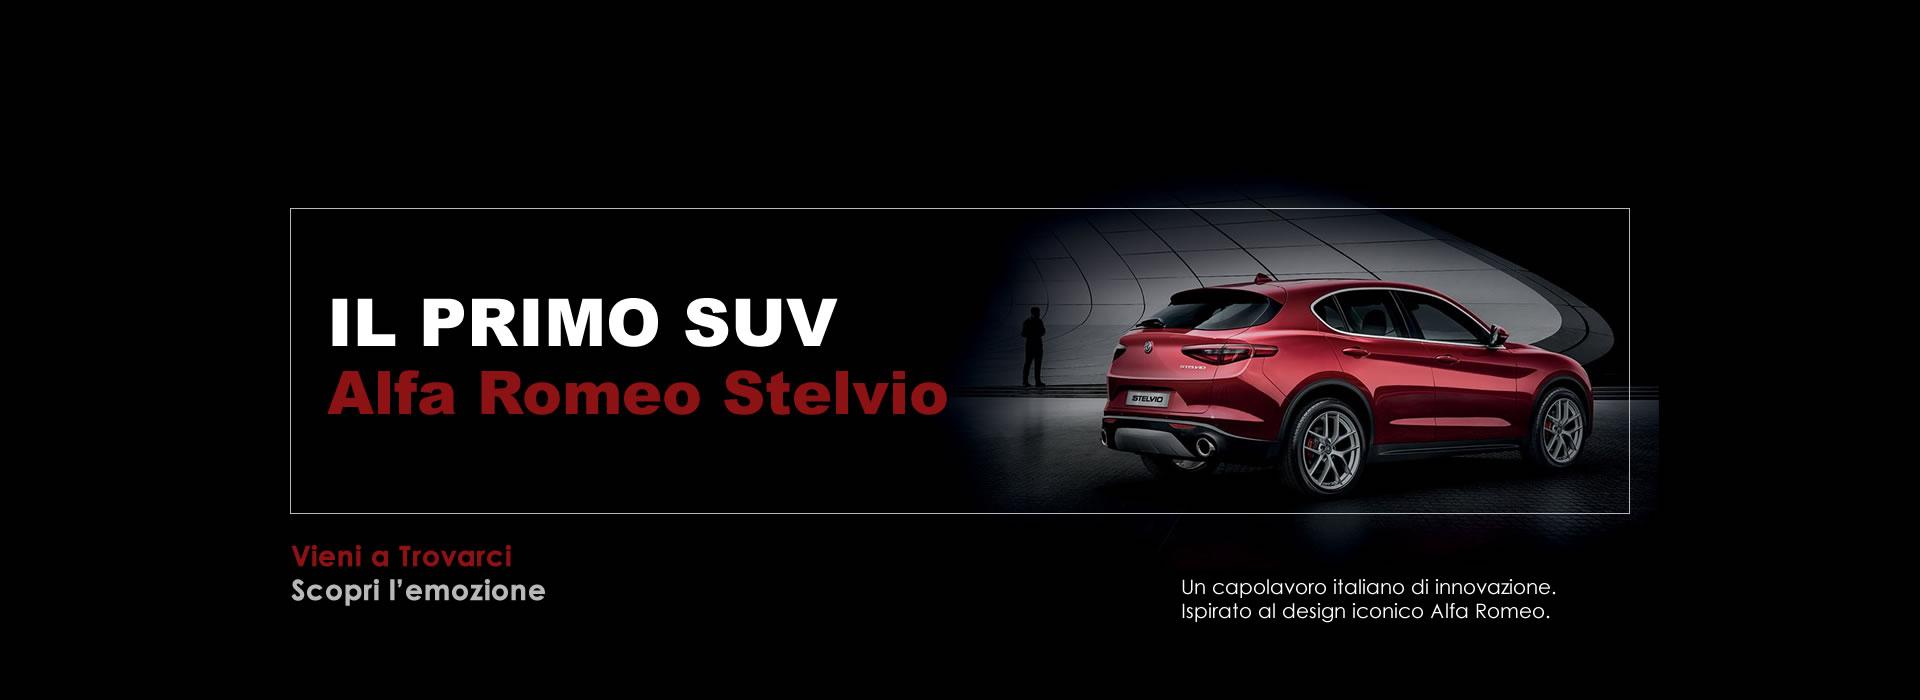 Concessionaria_Tamburini_Auto_Alfa-Romeo_Stelvio